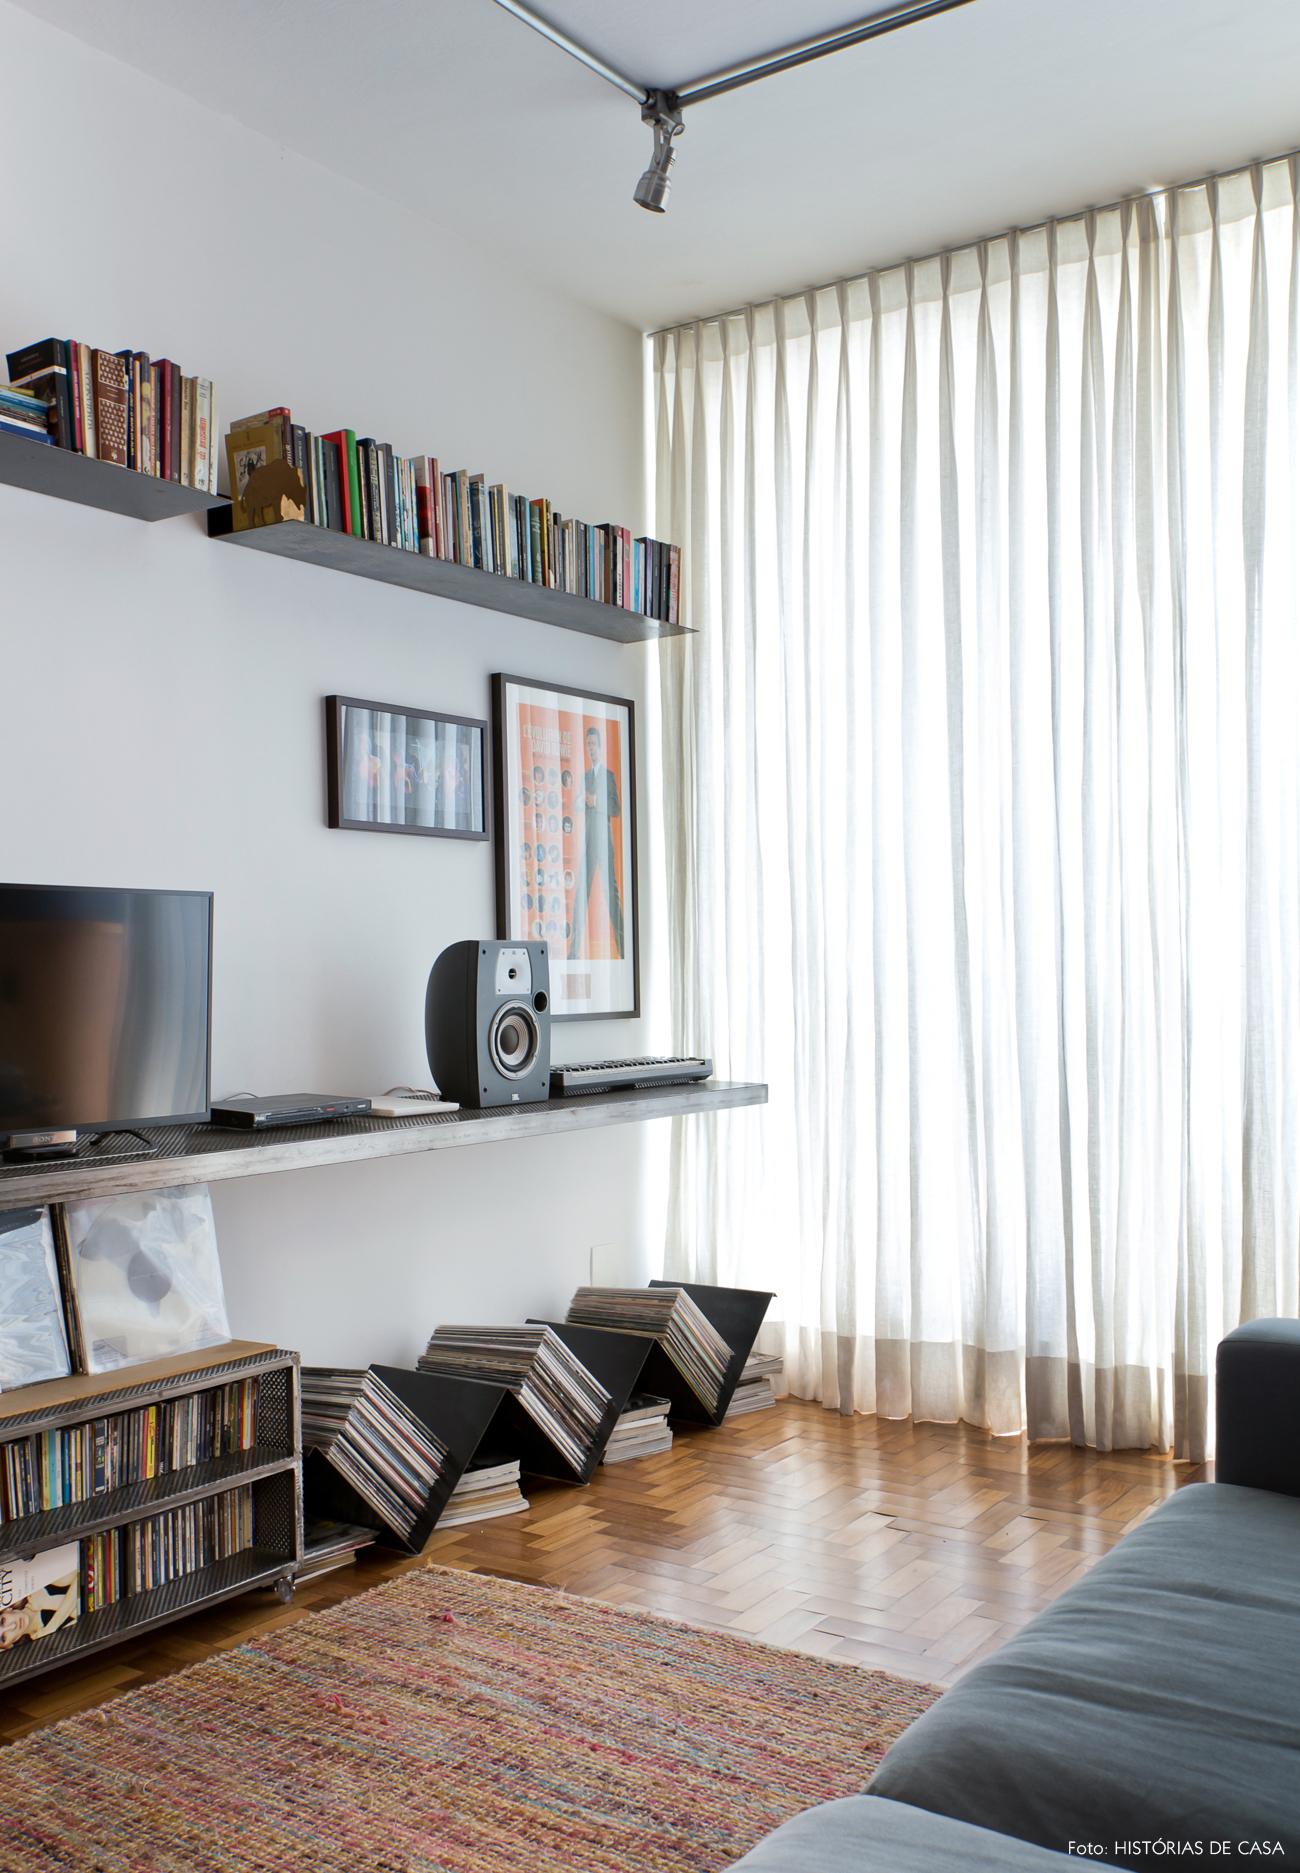 22-decoracao-sala-estar-colecao-discos-de-vinil-movel-metal